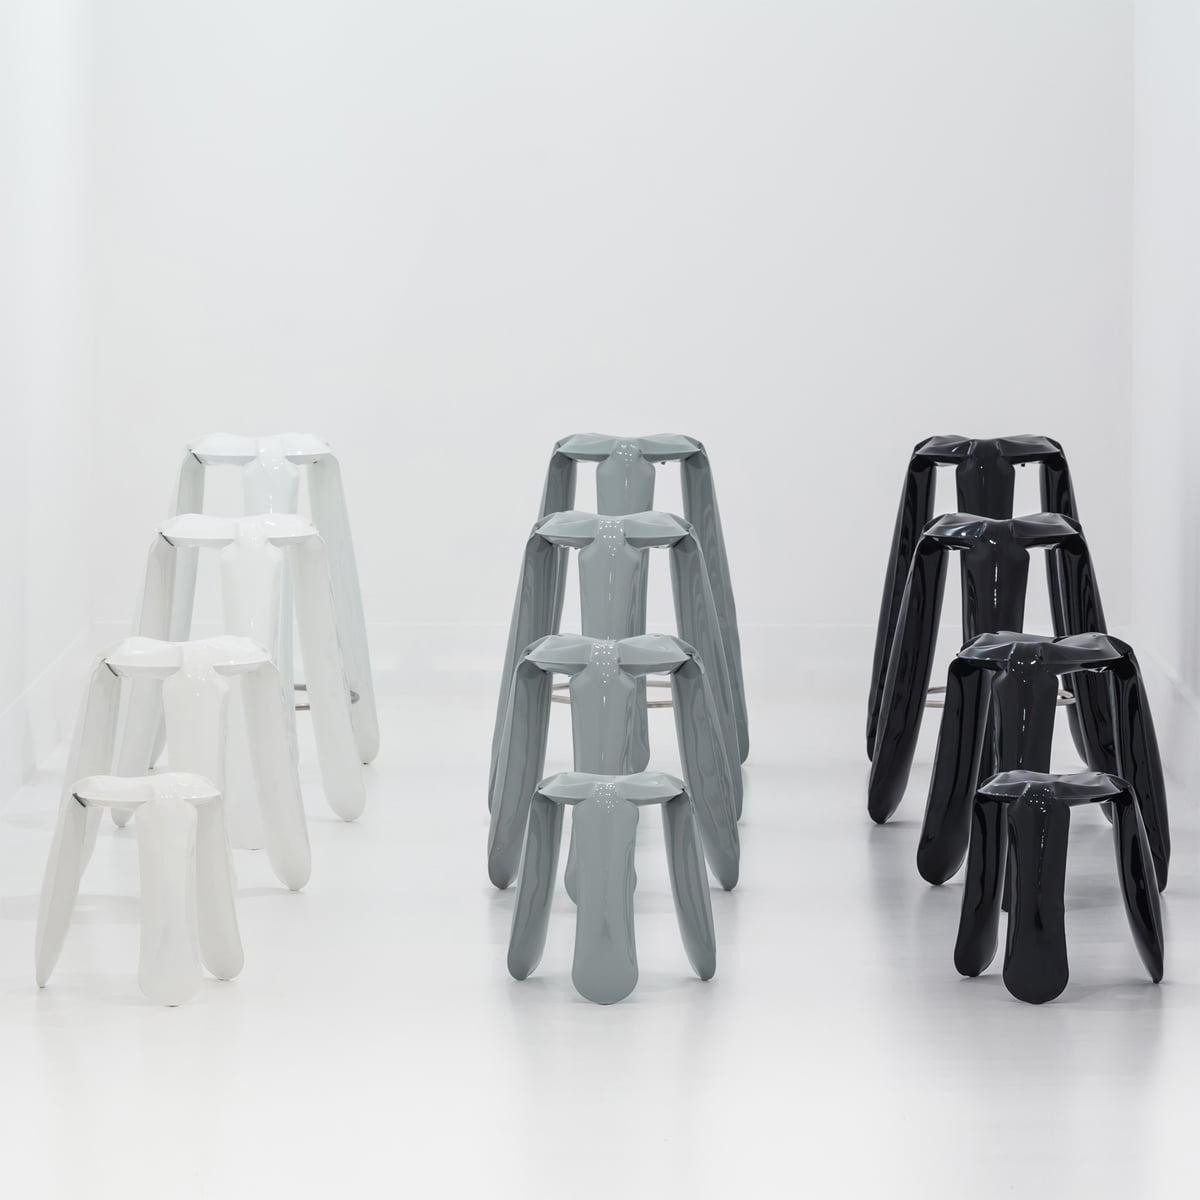 Admirable Zieta Plopp Bar Stool Black Inzonedesignstudio Interior Chair Design Inzonedesignstudiocom